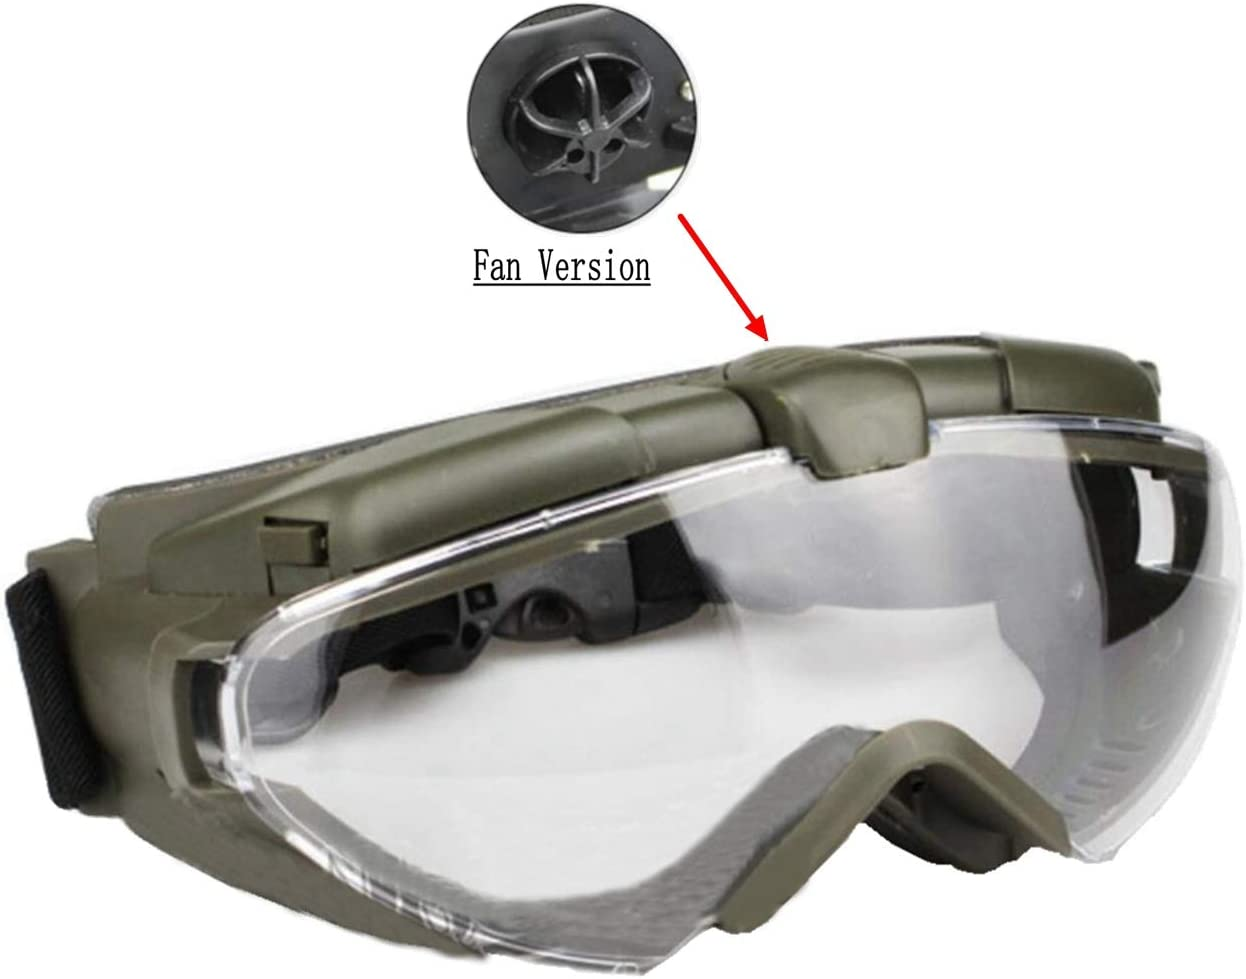 SGOYH Tactical Fan Version Cooler Airsoft Paintball Gafas Regulador Gafas Protectoras para la Caza Snowboard Ski Shooting Bike Deportes